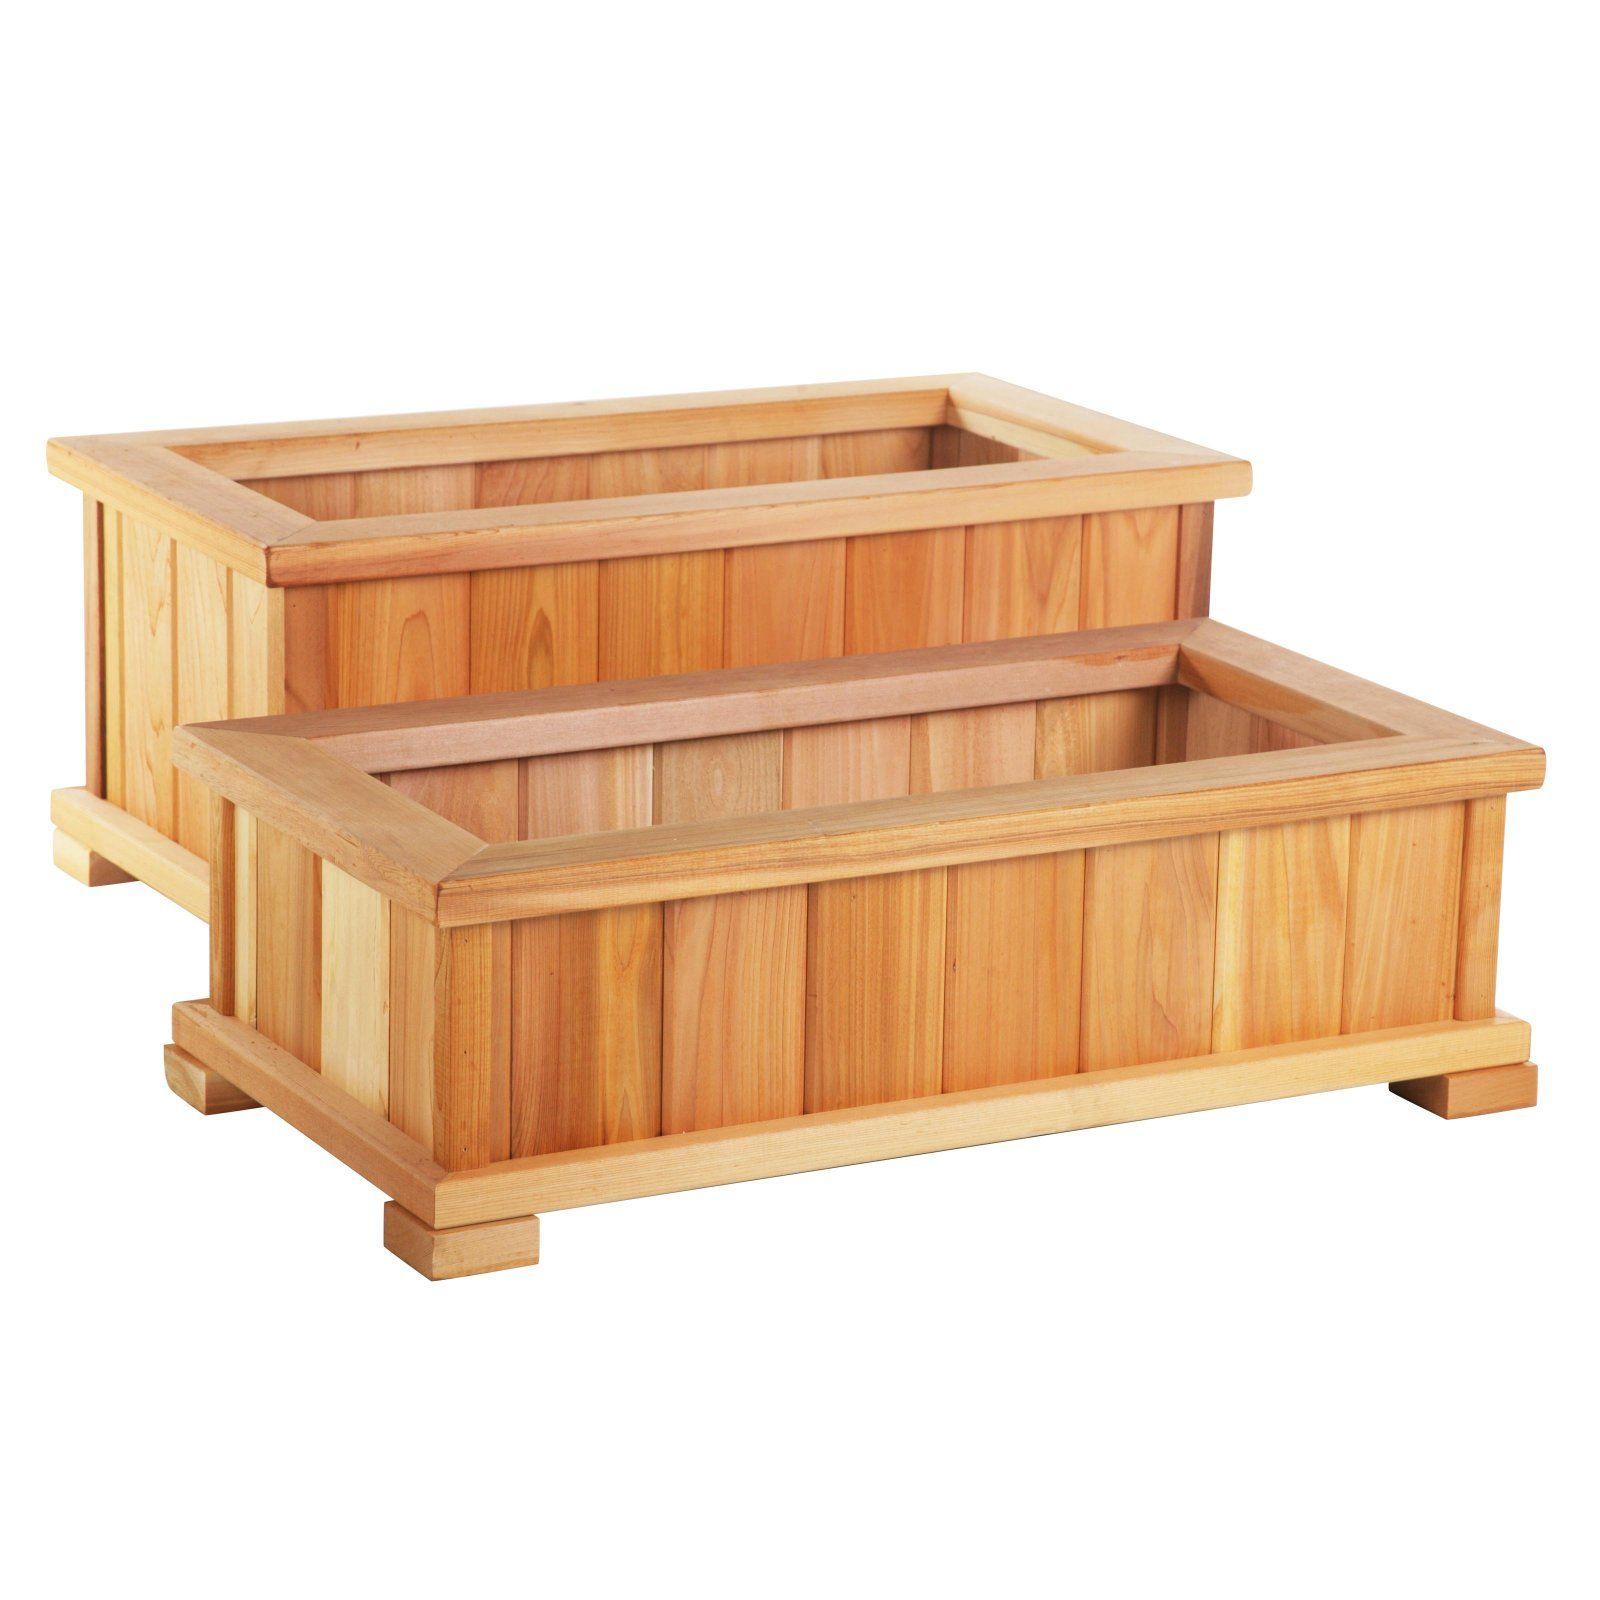 Wooden planter box pinteres for Wooden garden planters